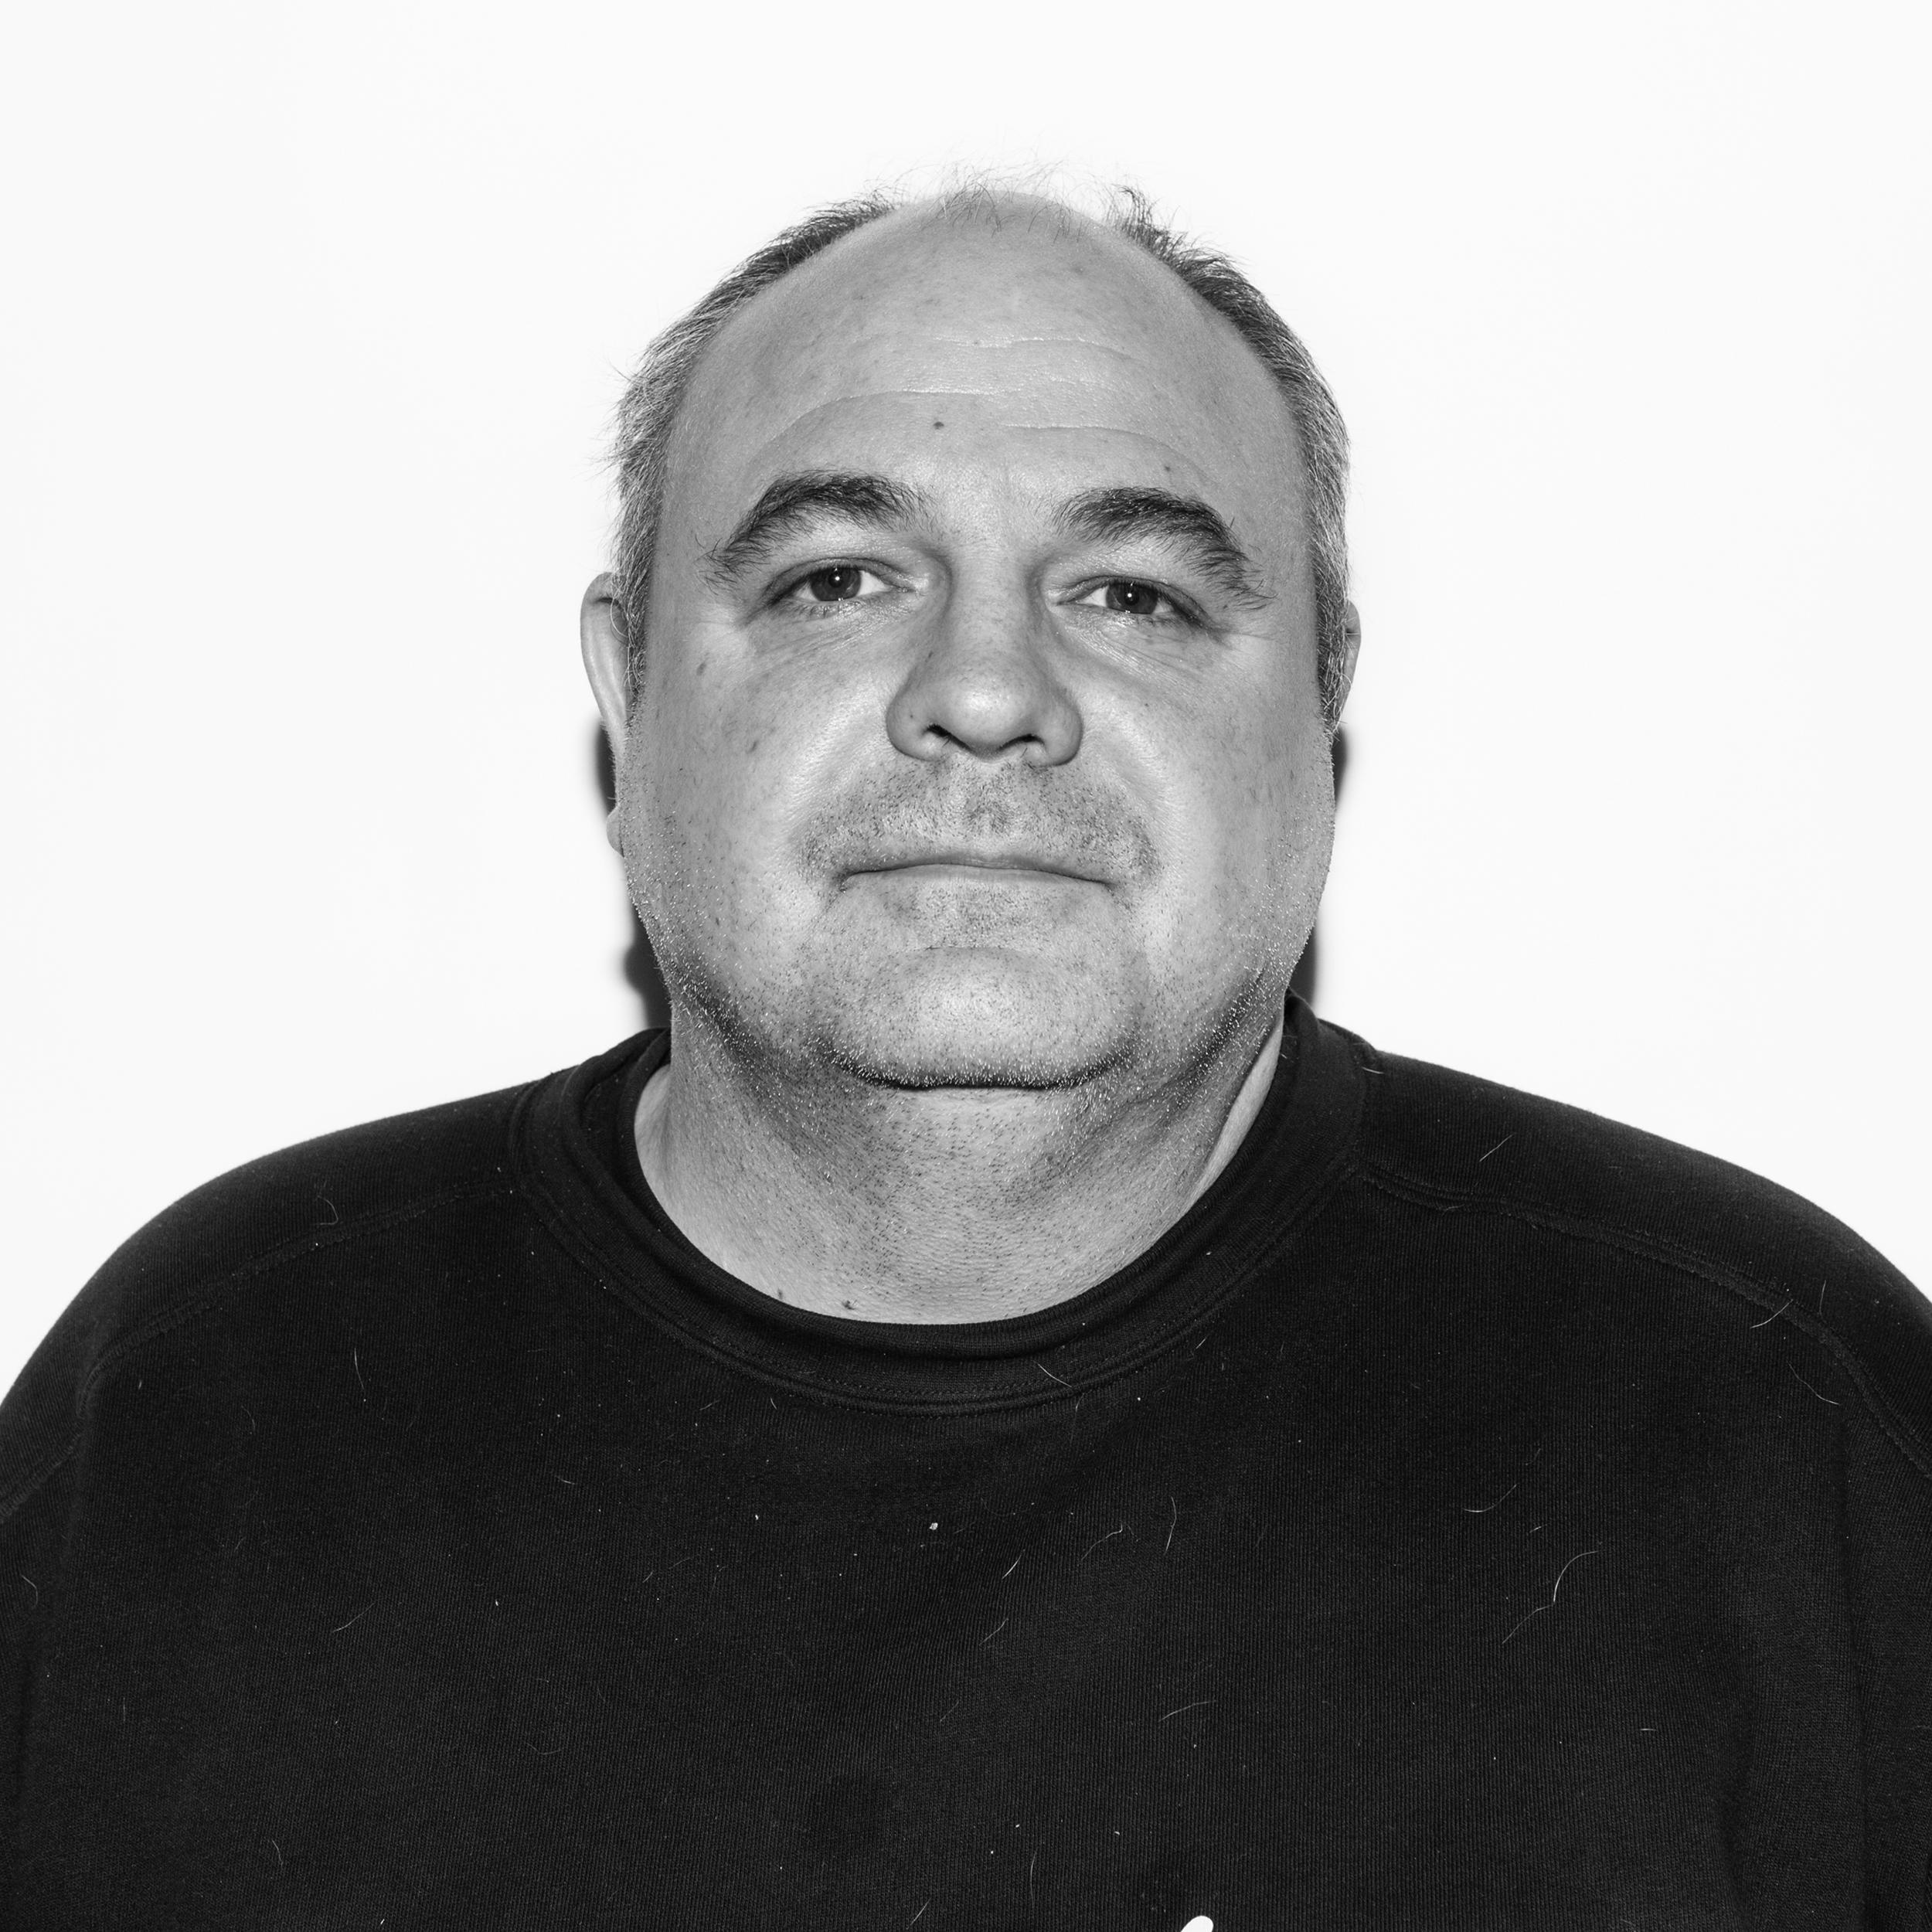 Jerry Wihlstrand